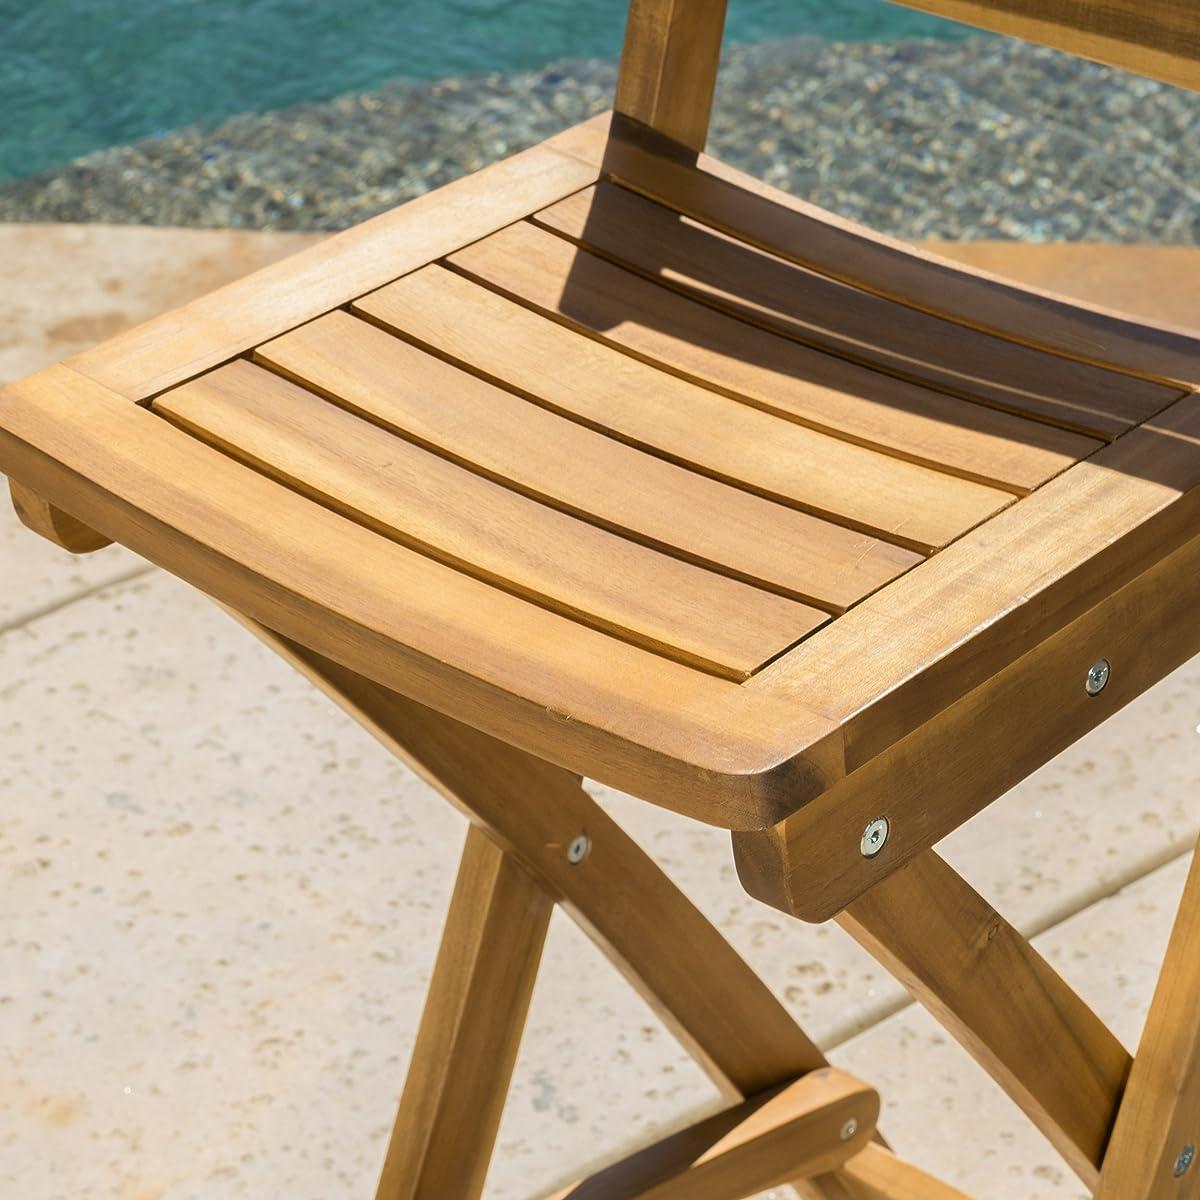 Atlantic Outdoor Folding Wood Bar Stools (Set of 2)